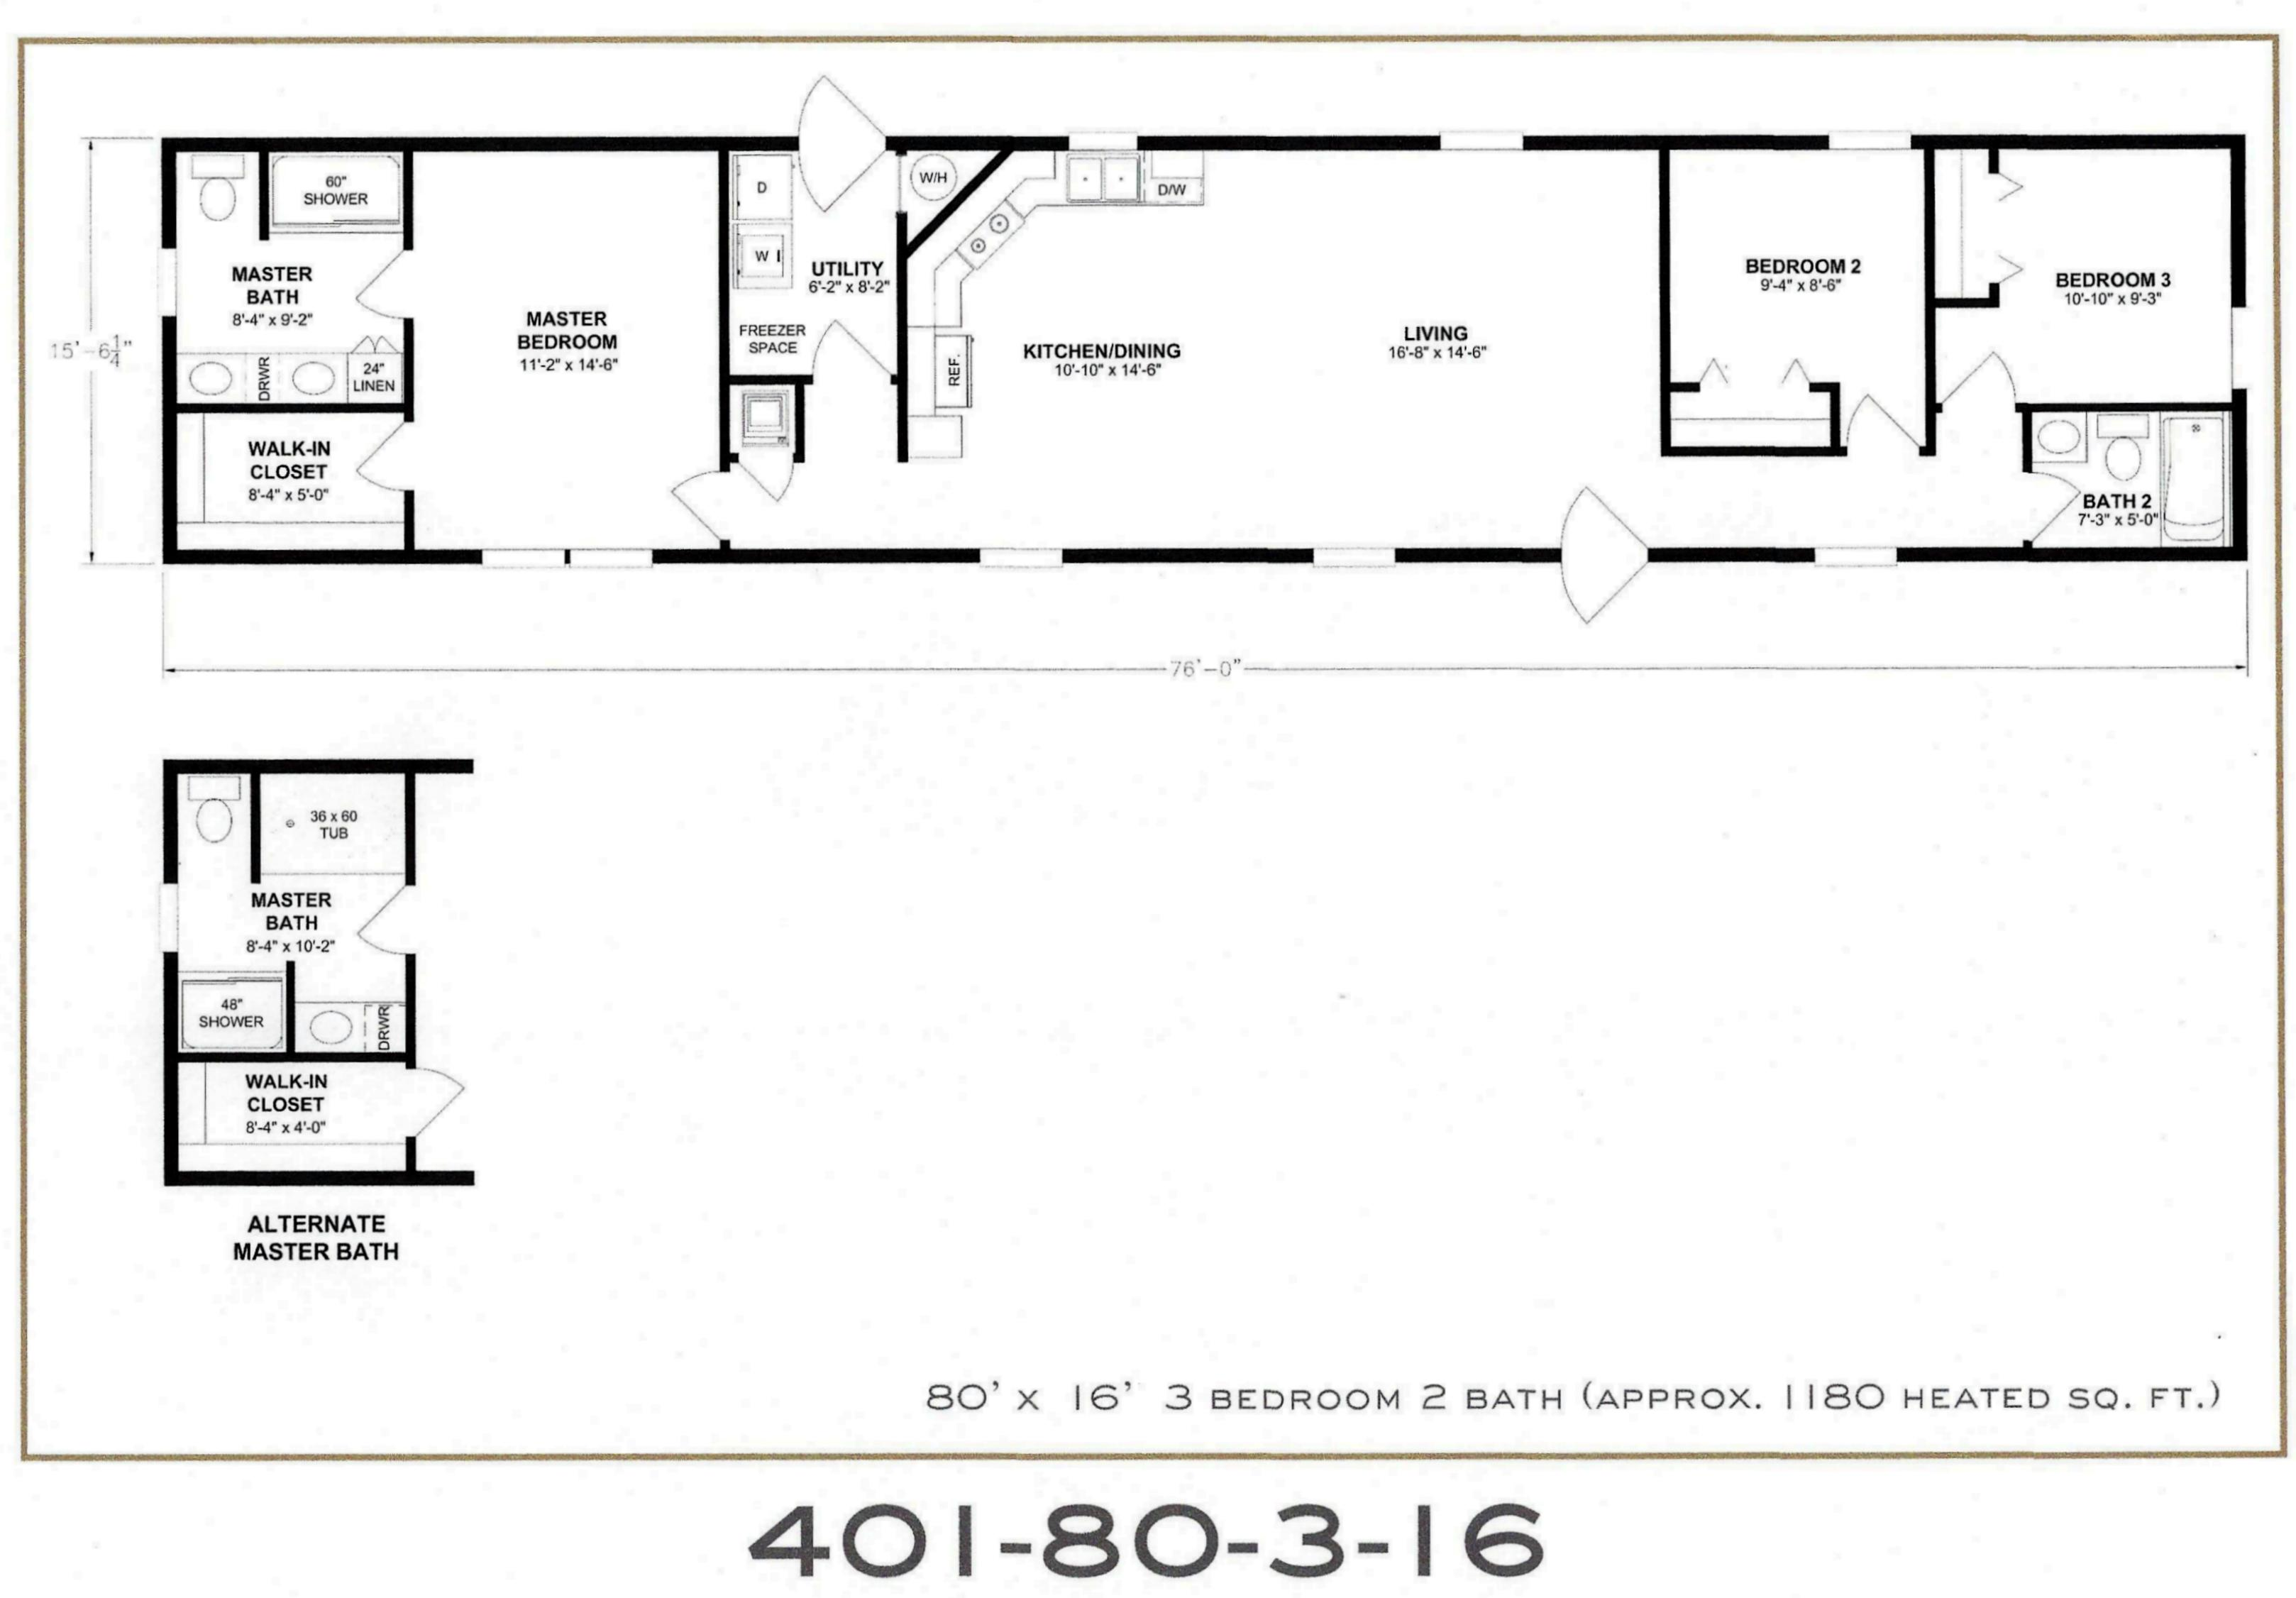 3 Bedroom Floor Plan F 401 Hawks Homes Manufactured